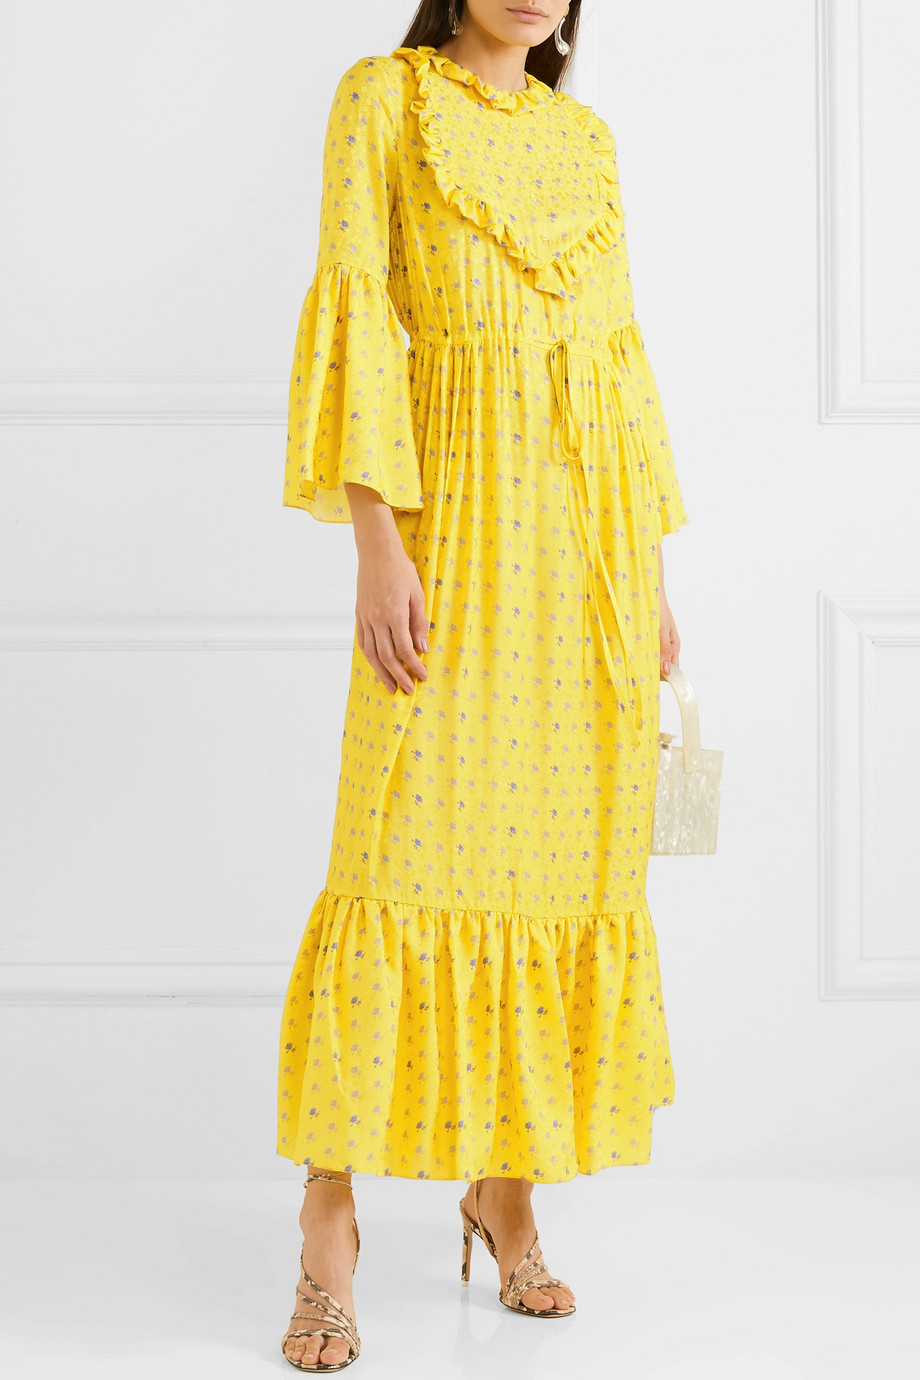 Preen by Thornton Bregazzi Tessa ruffled floral-jacquard maxi dress